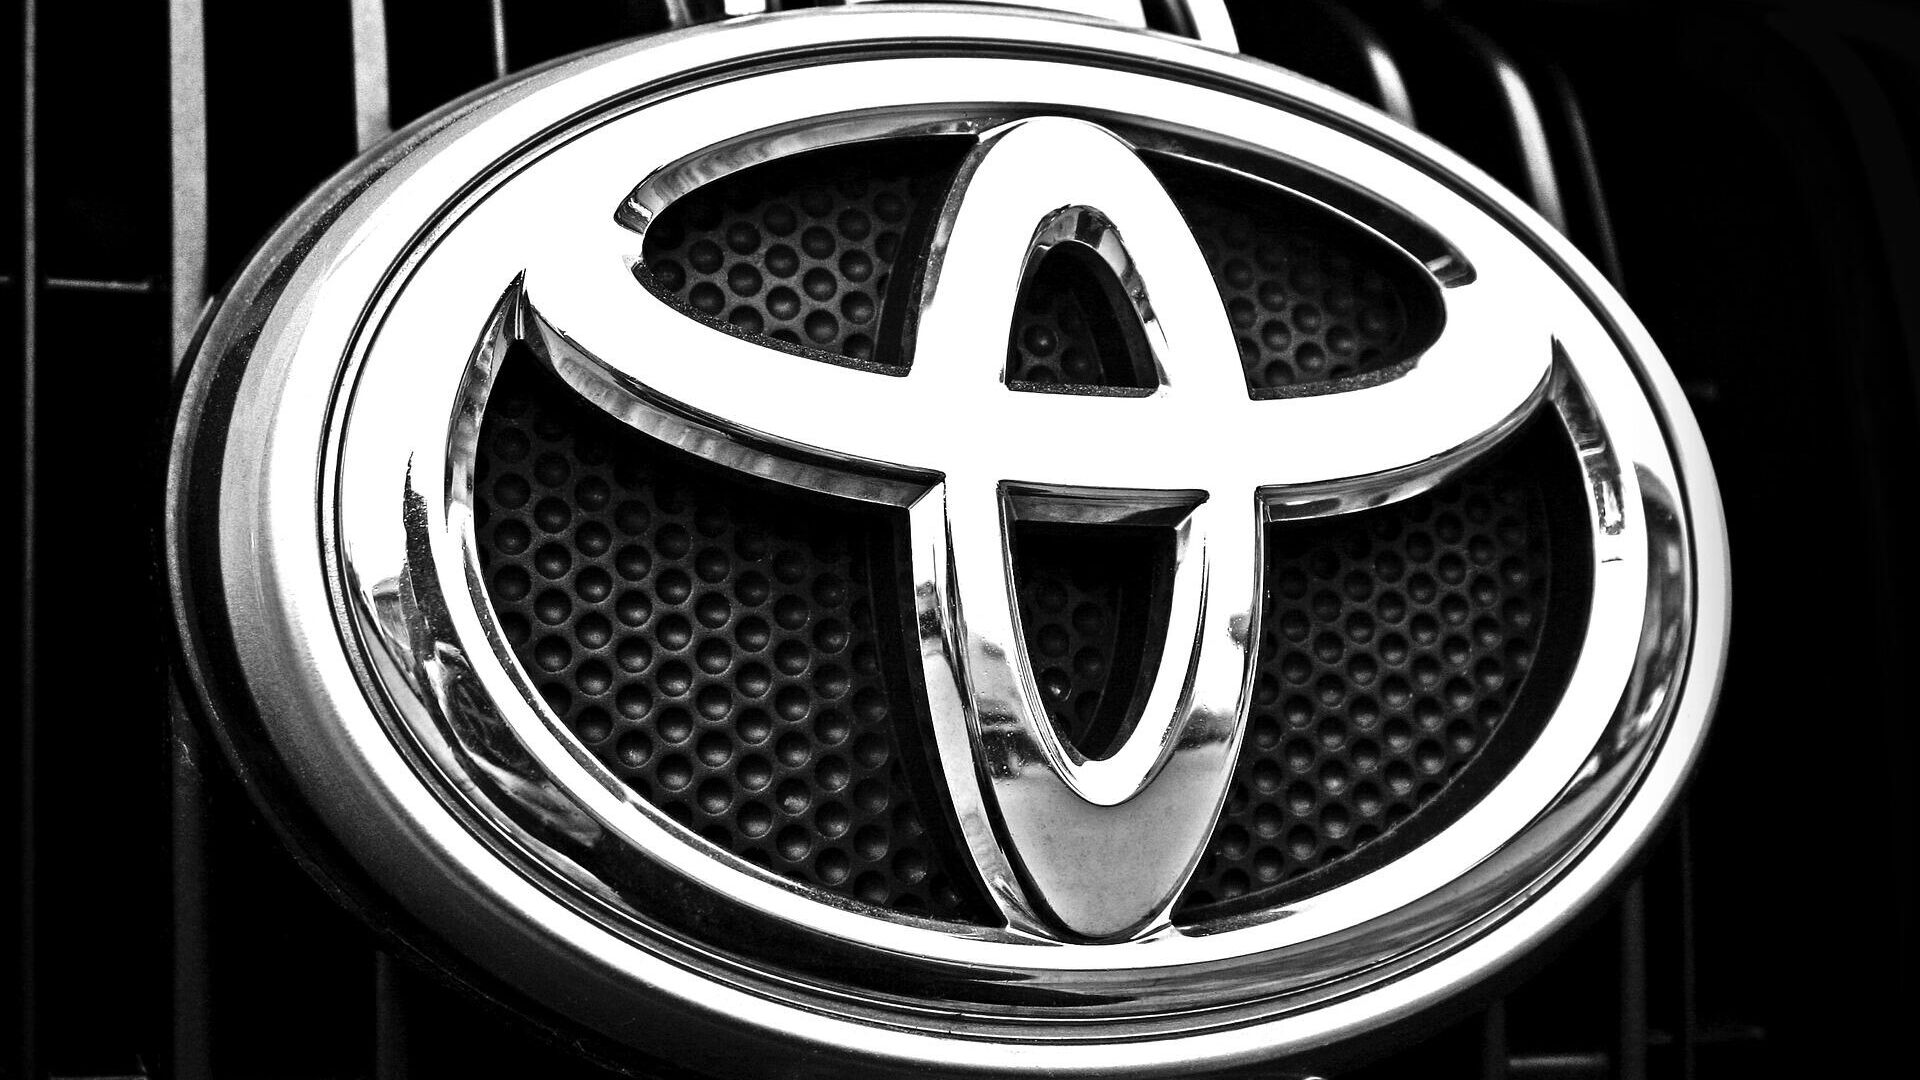 El logo de Toyota - Sputnik Mundo, 1920, 28.04.2021